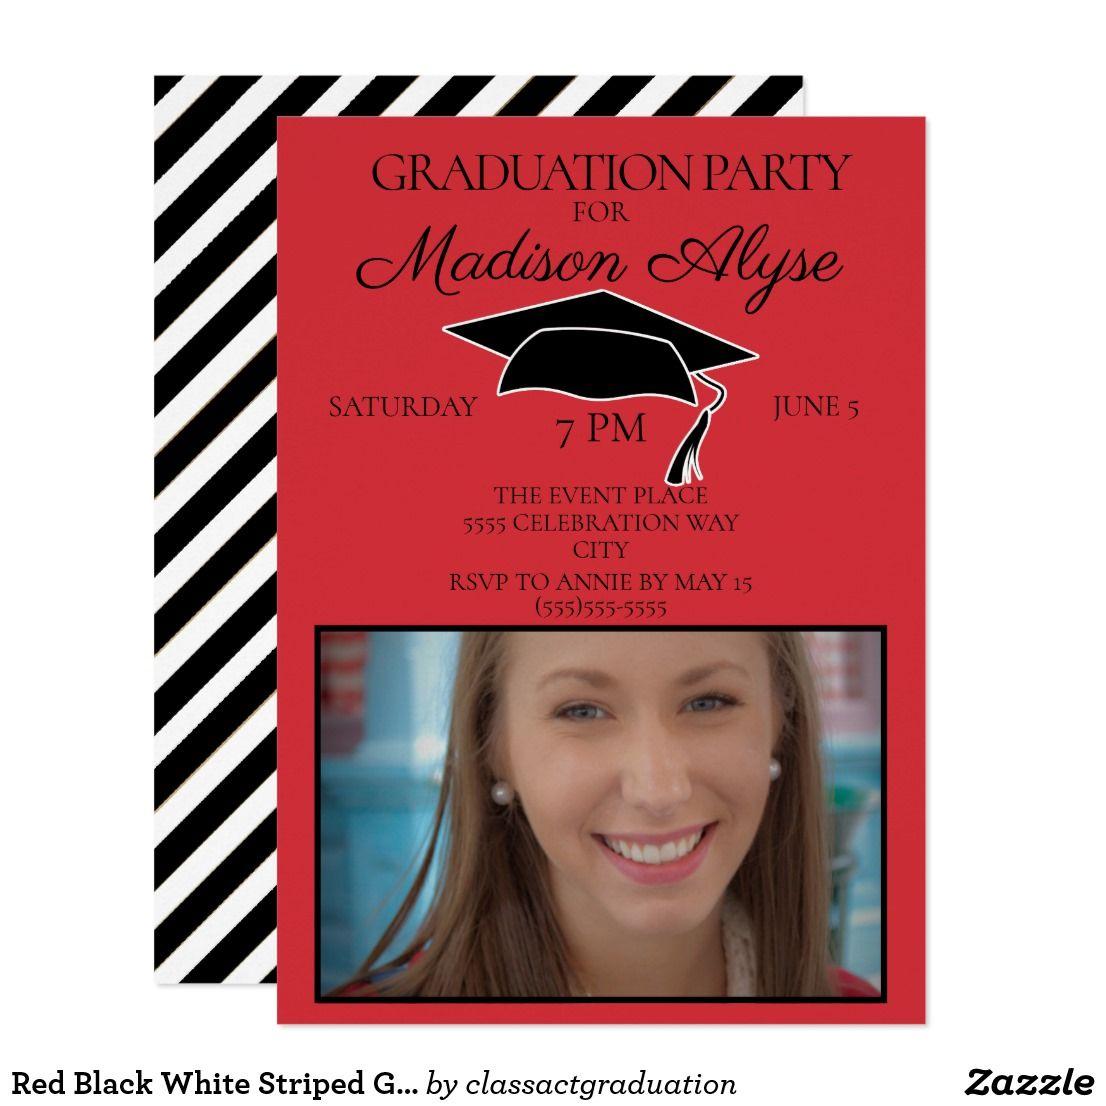 Red Black White Striped Graduation Party Photo Invitation ...